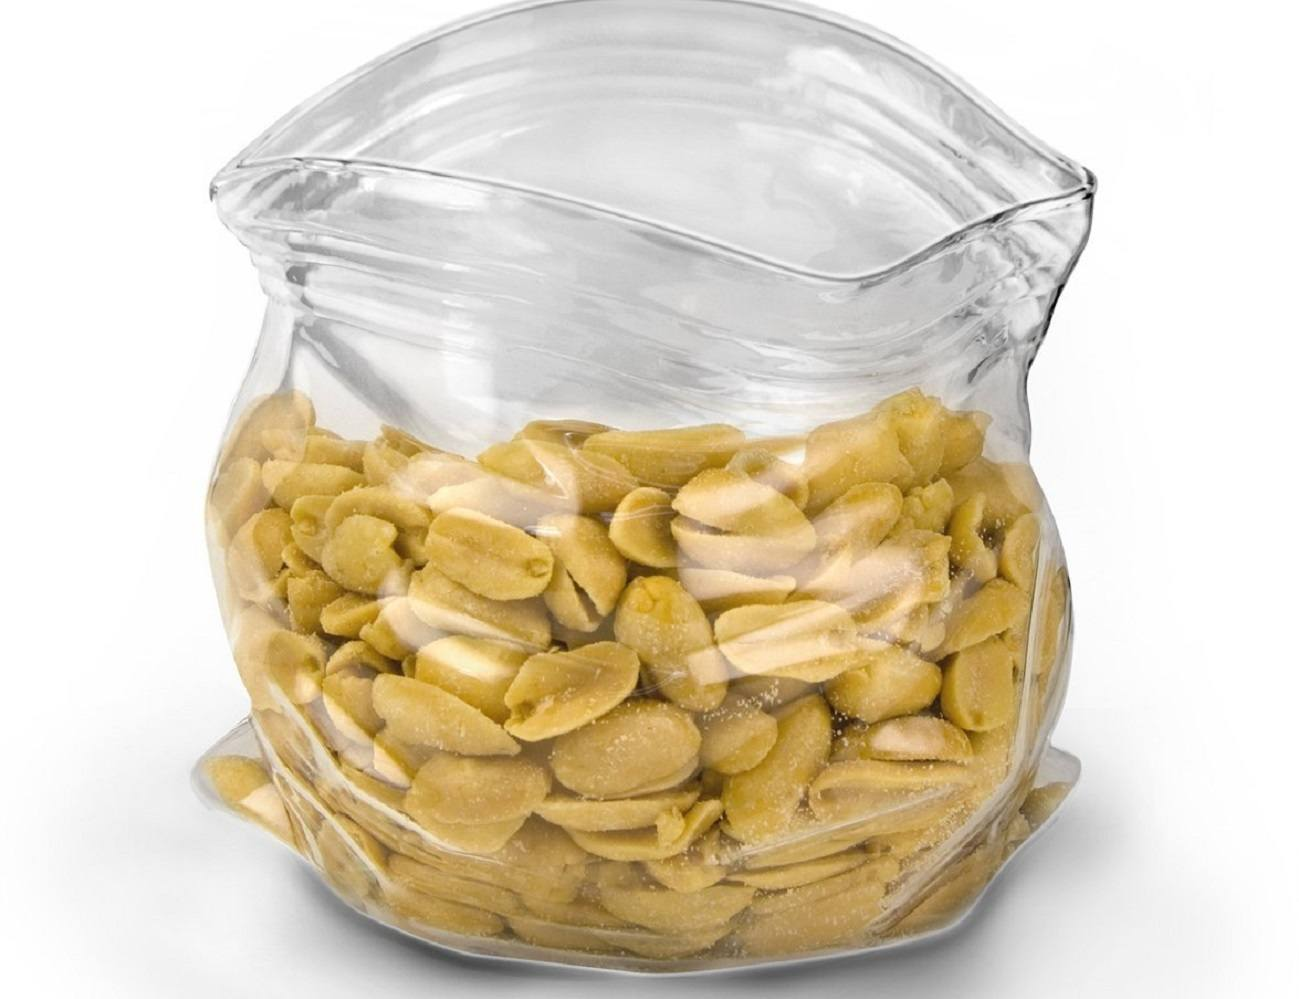 Unzipped Glass Snack Bag